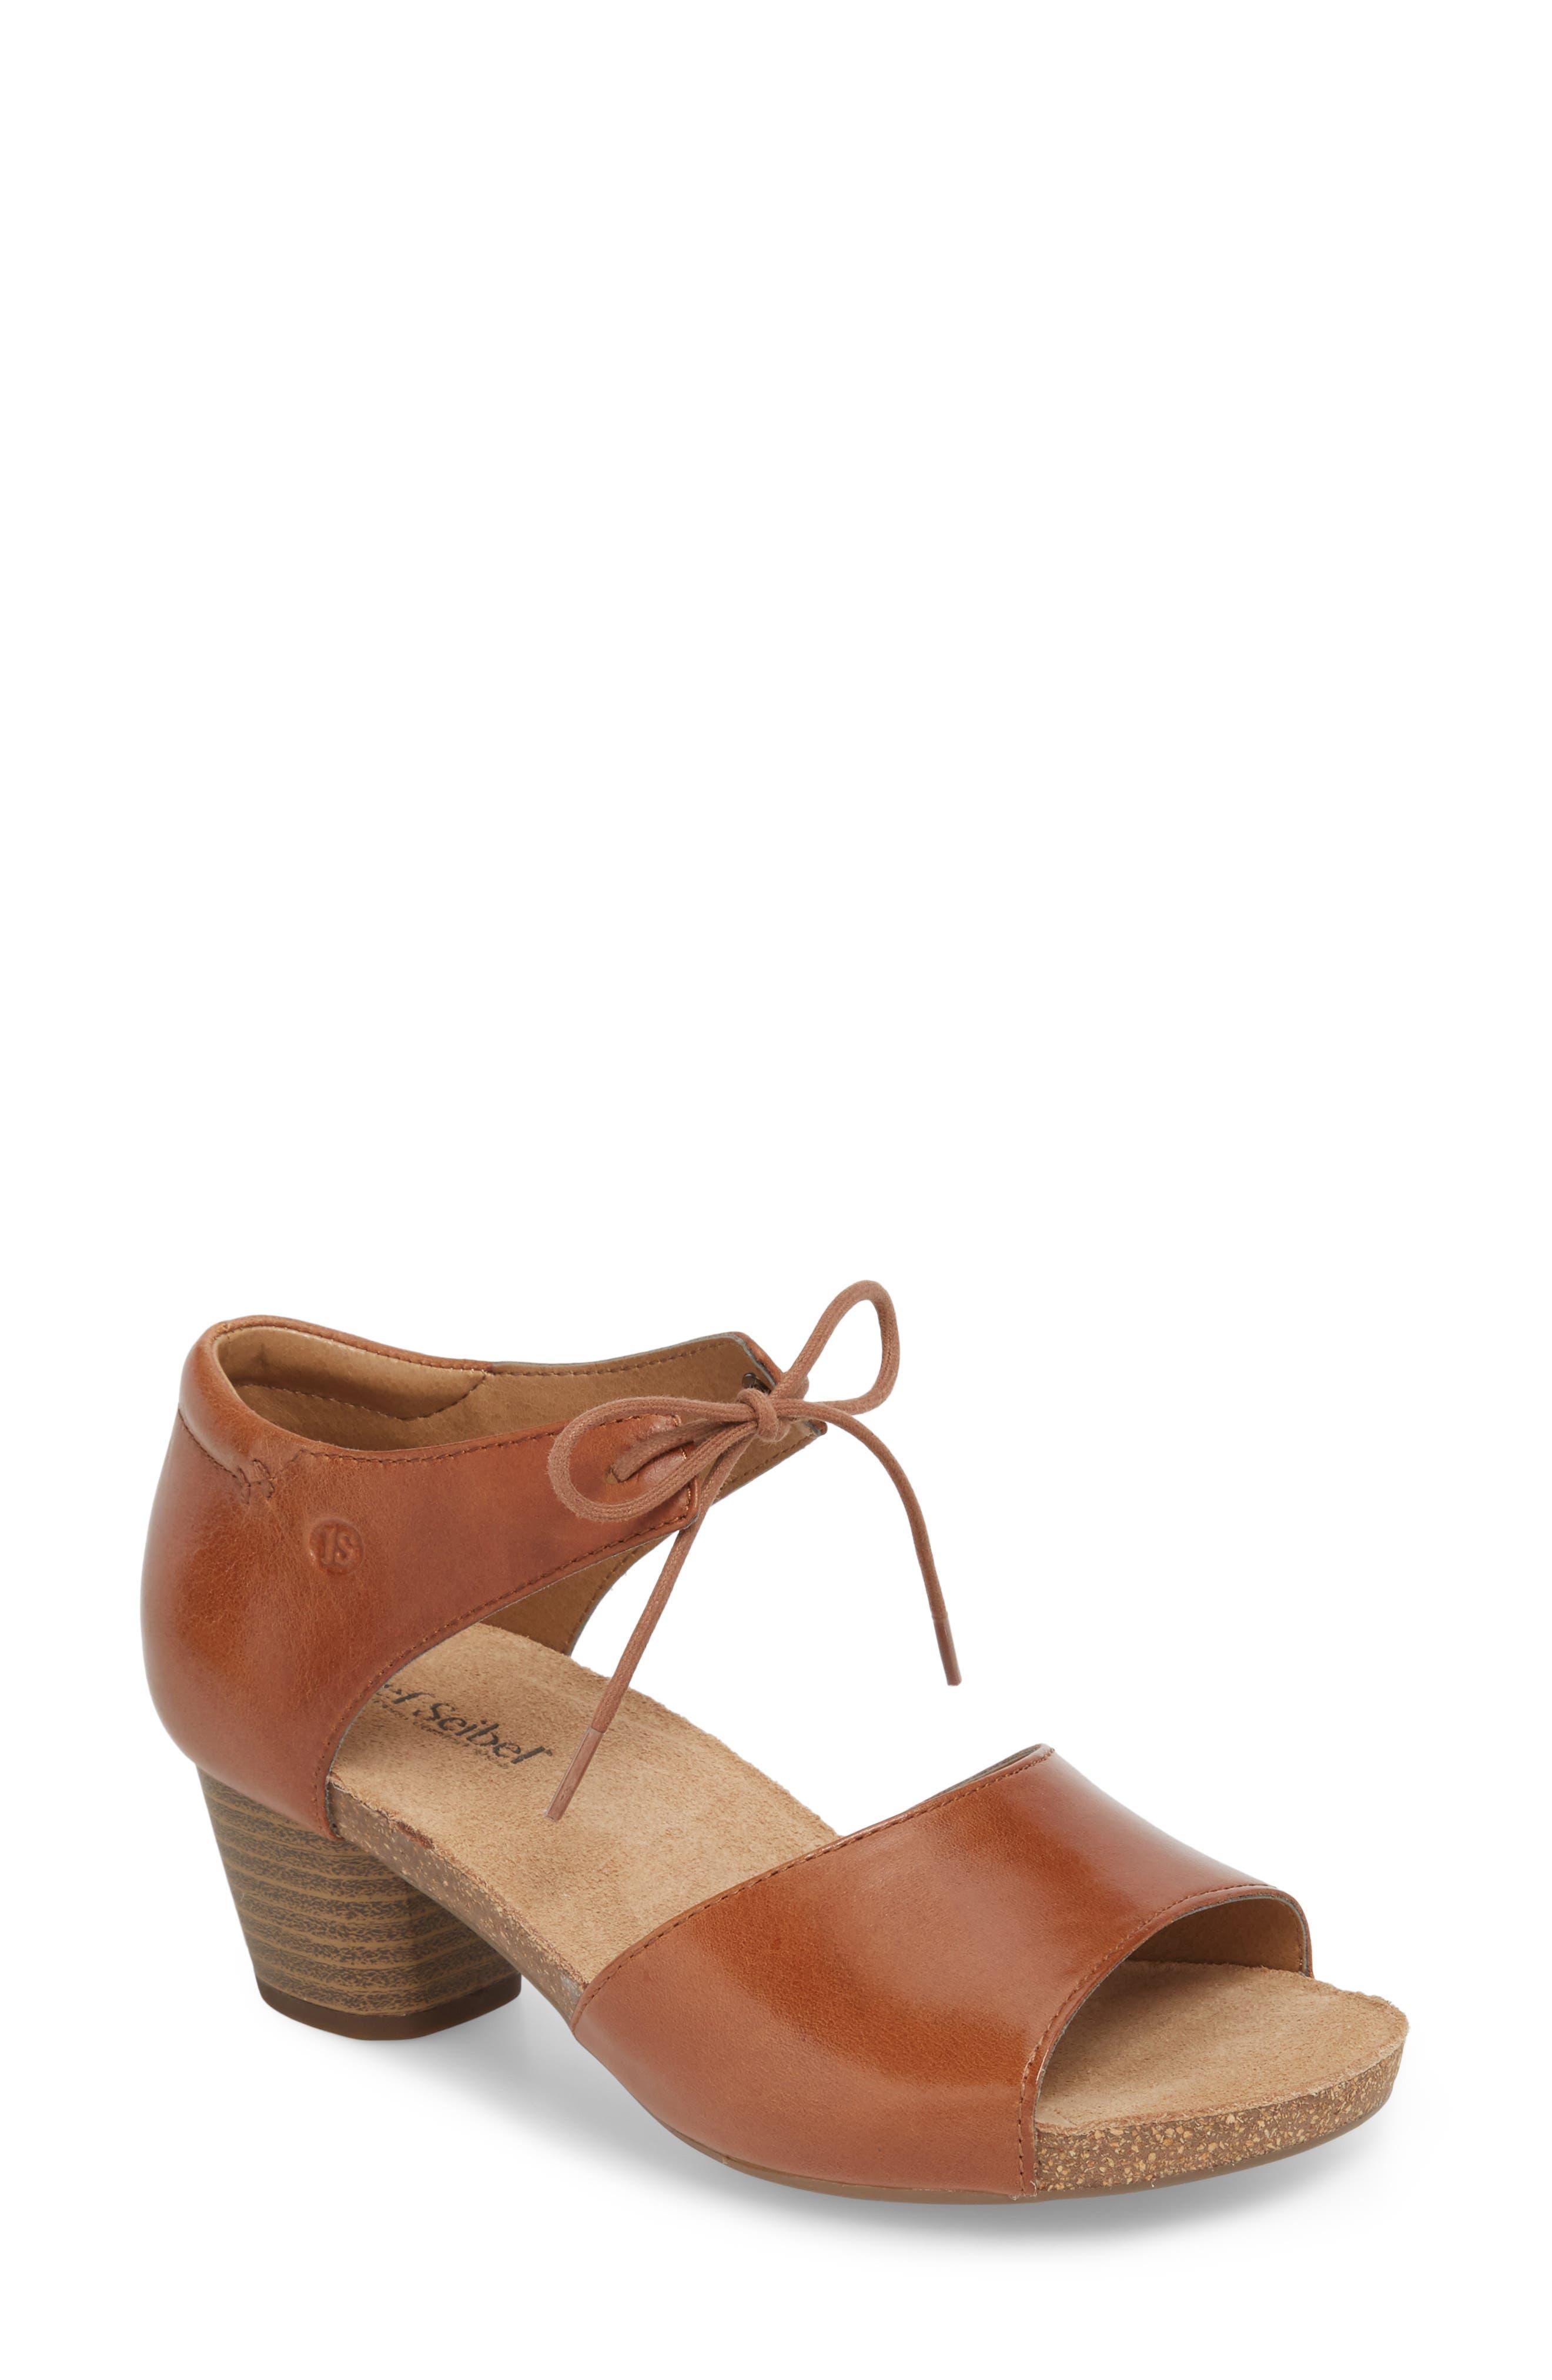 Josef Seibel Rose 23 Tie Front Sandal, Brown